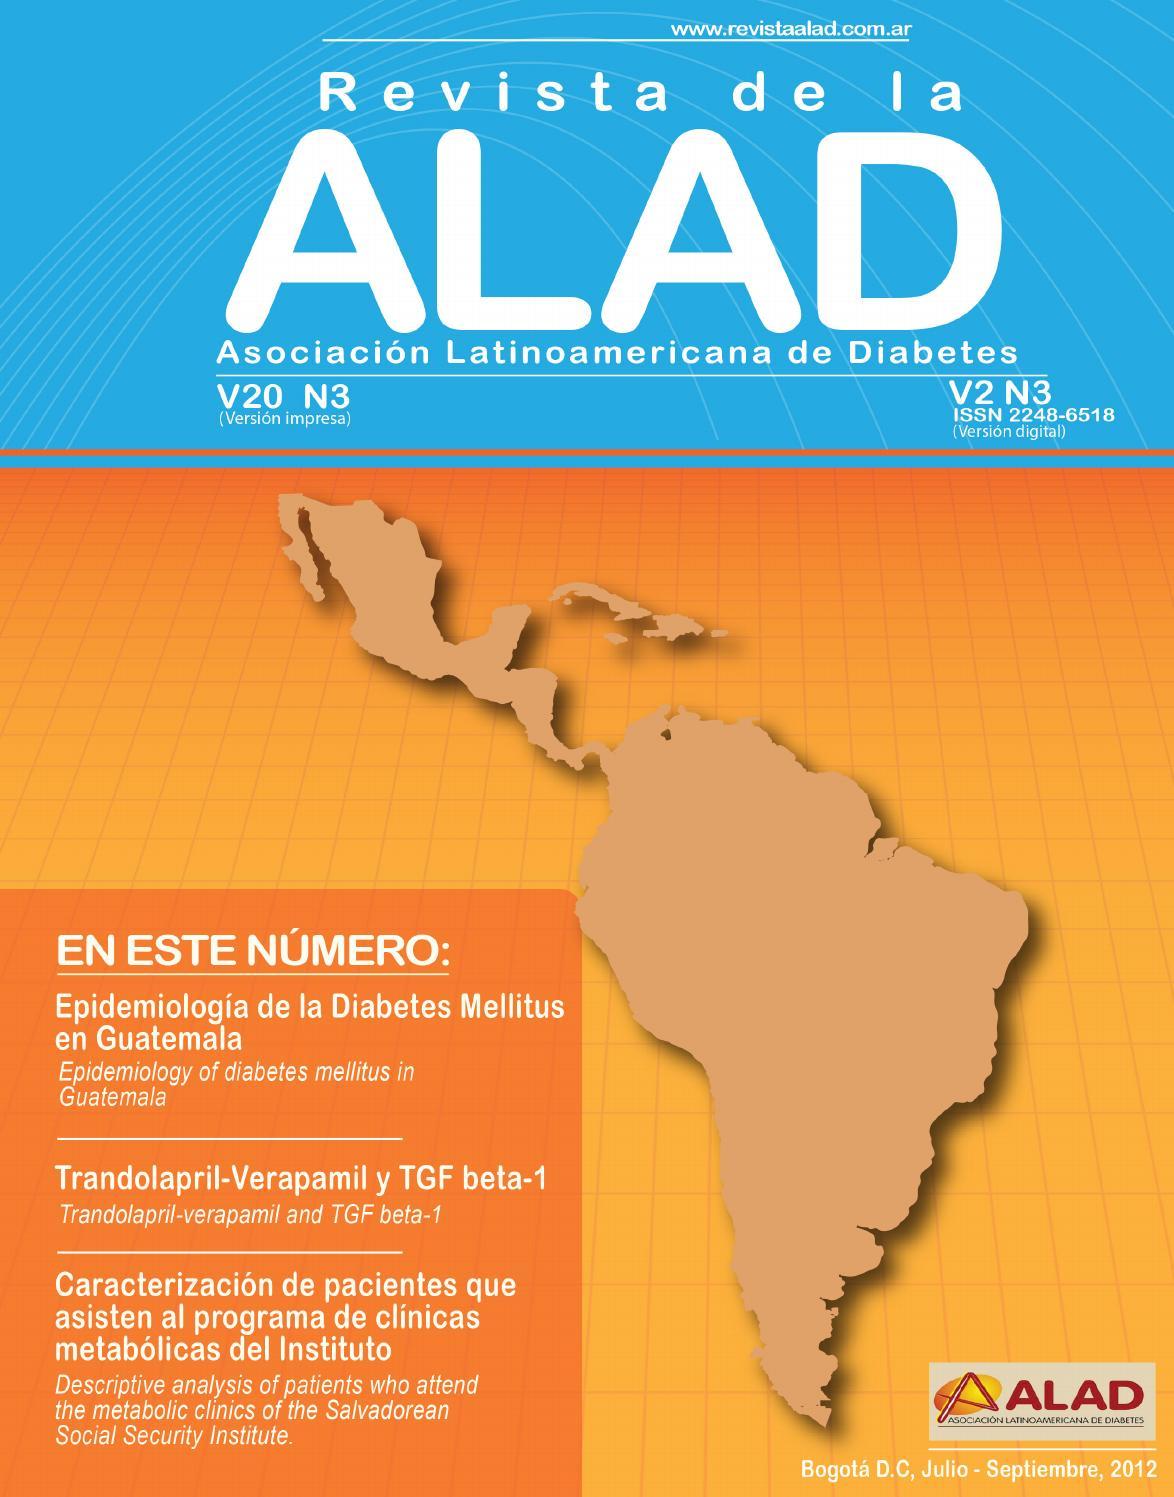 Revista de la Asociacion Latinoamericana de Diabates Vol2